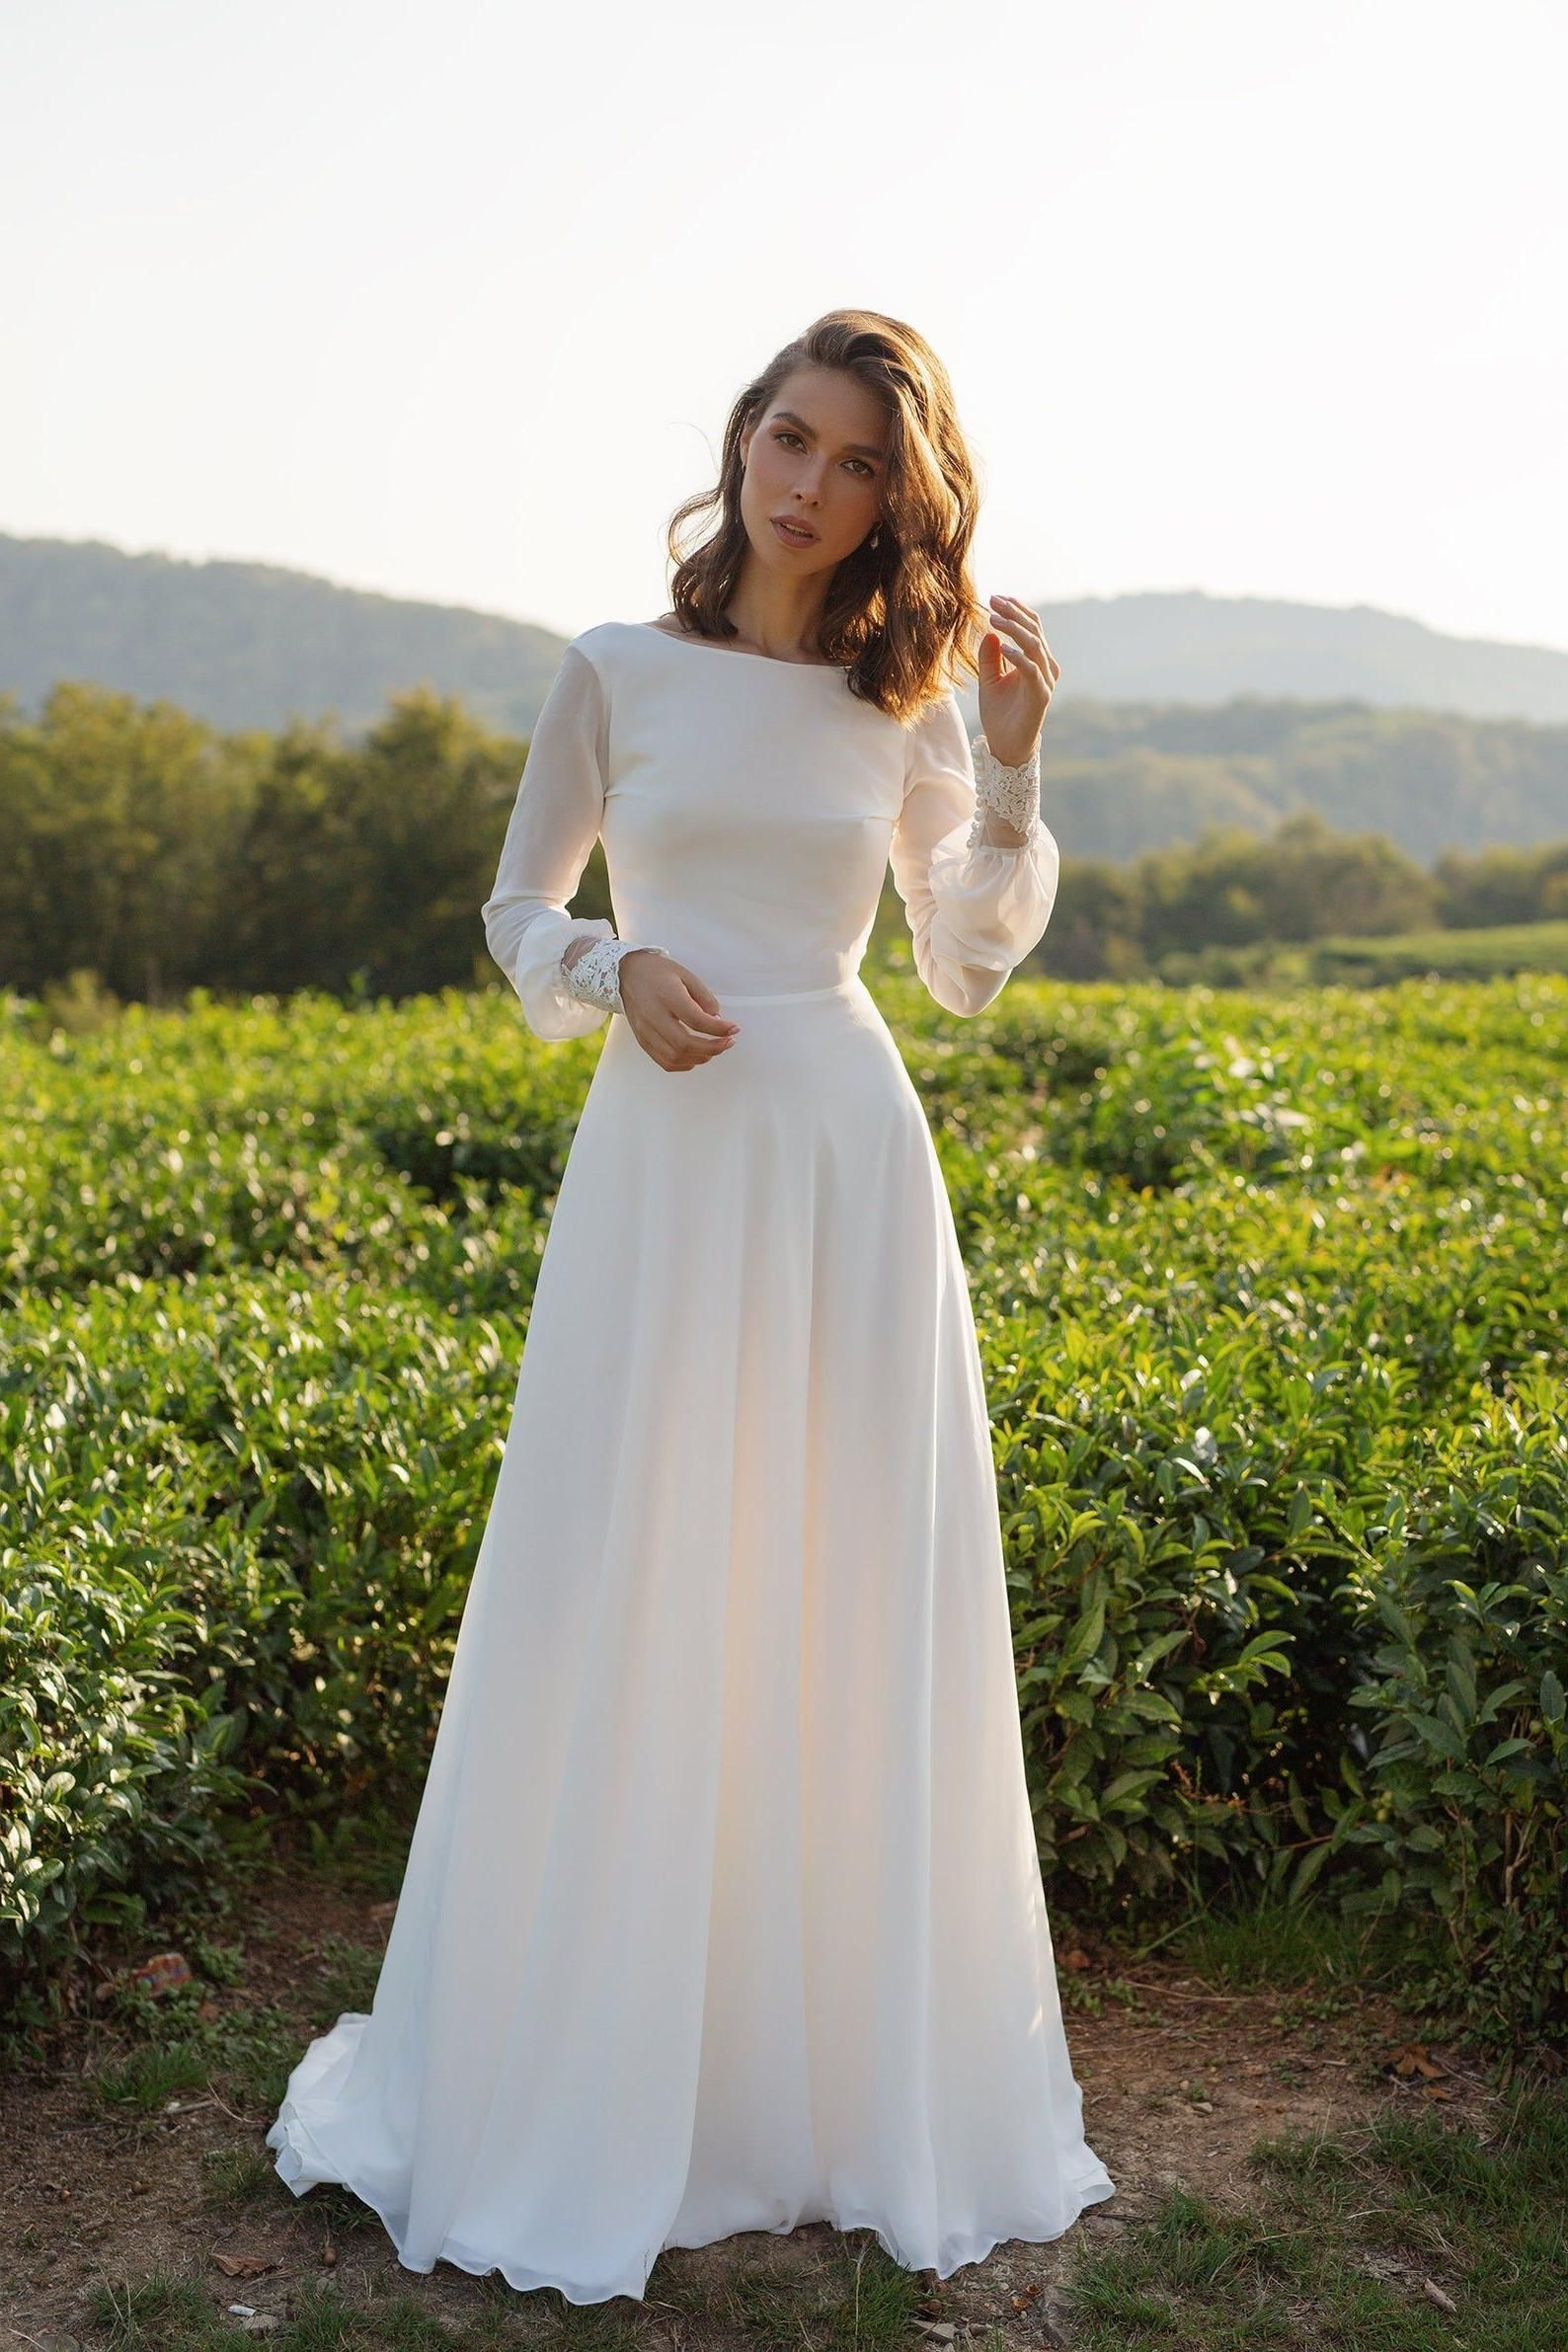 Pin On Wedding Dresses Backless Ideas Wedding Dress Long Sleeve Wedding Dresses Wedding Dresses Vintage [ 2382 x 1588 Pixel ]